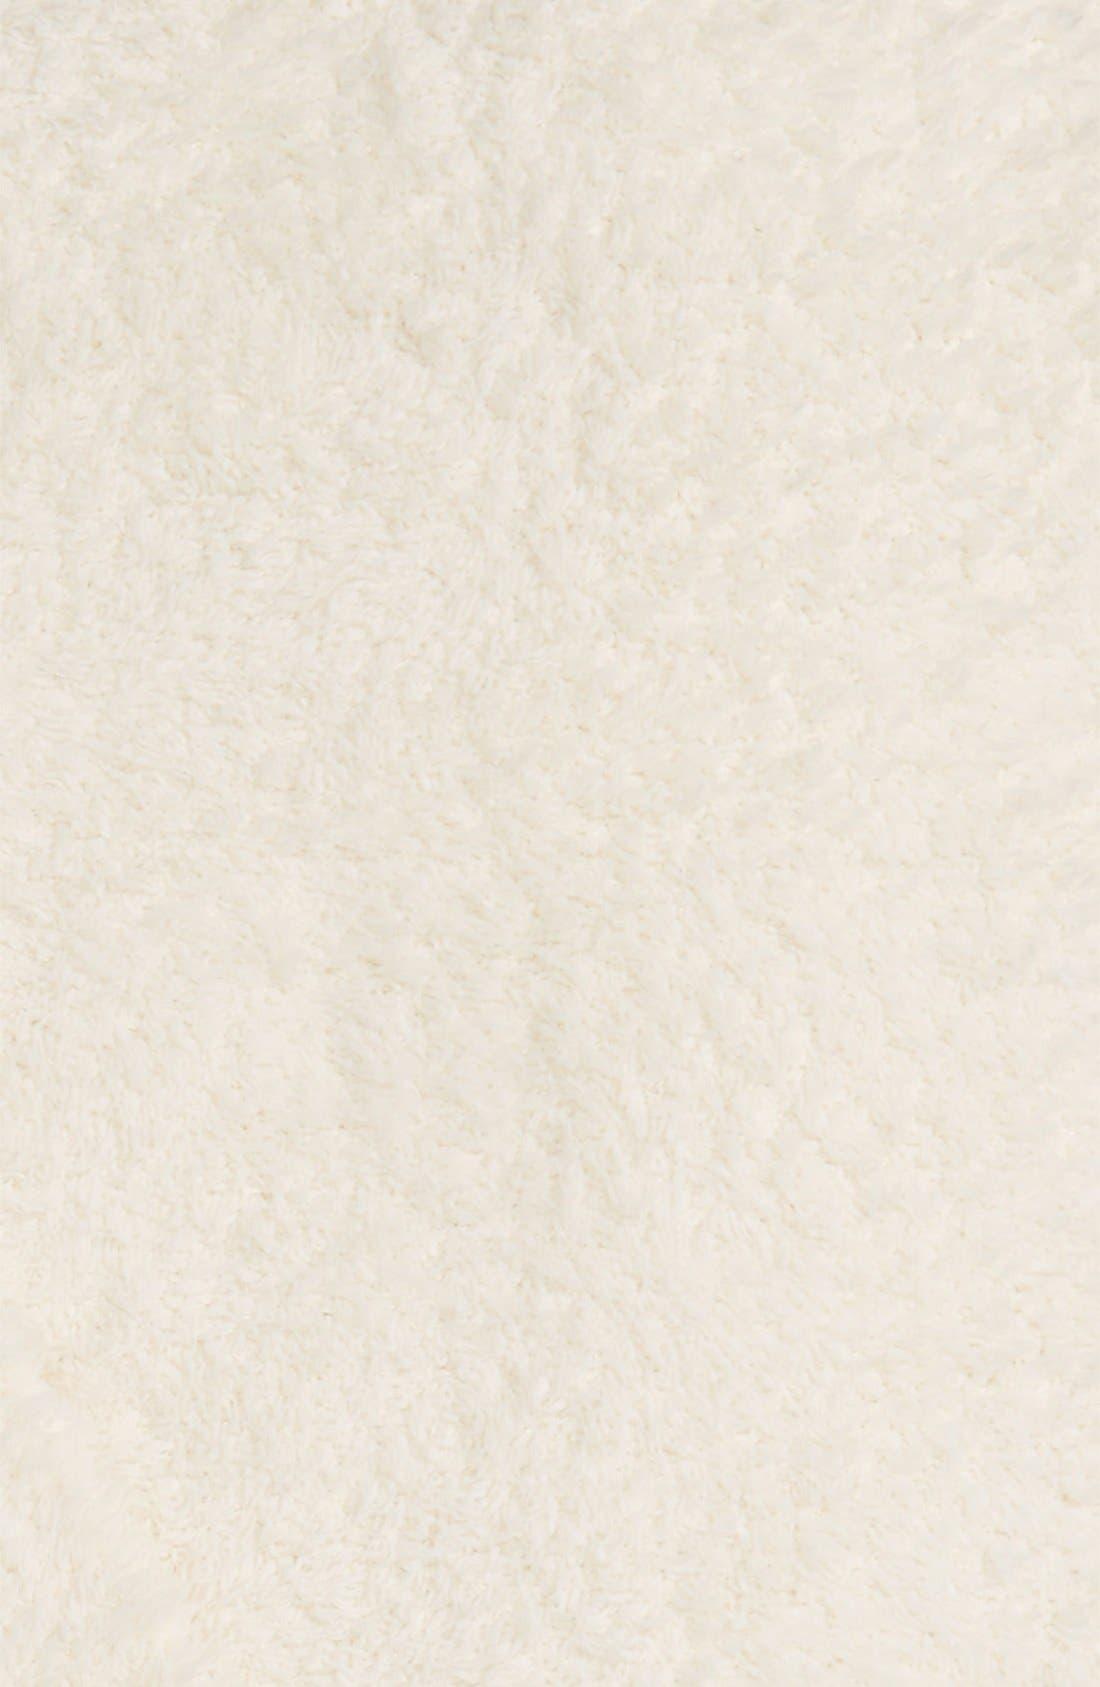 Alternate Image 2  - Barefoot Dreams® Chic Blanket